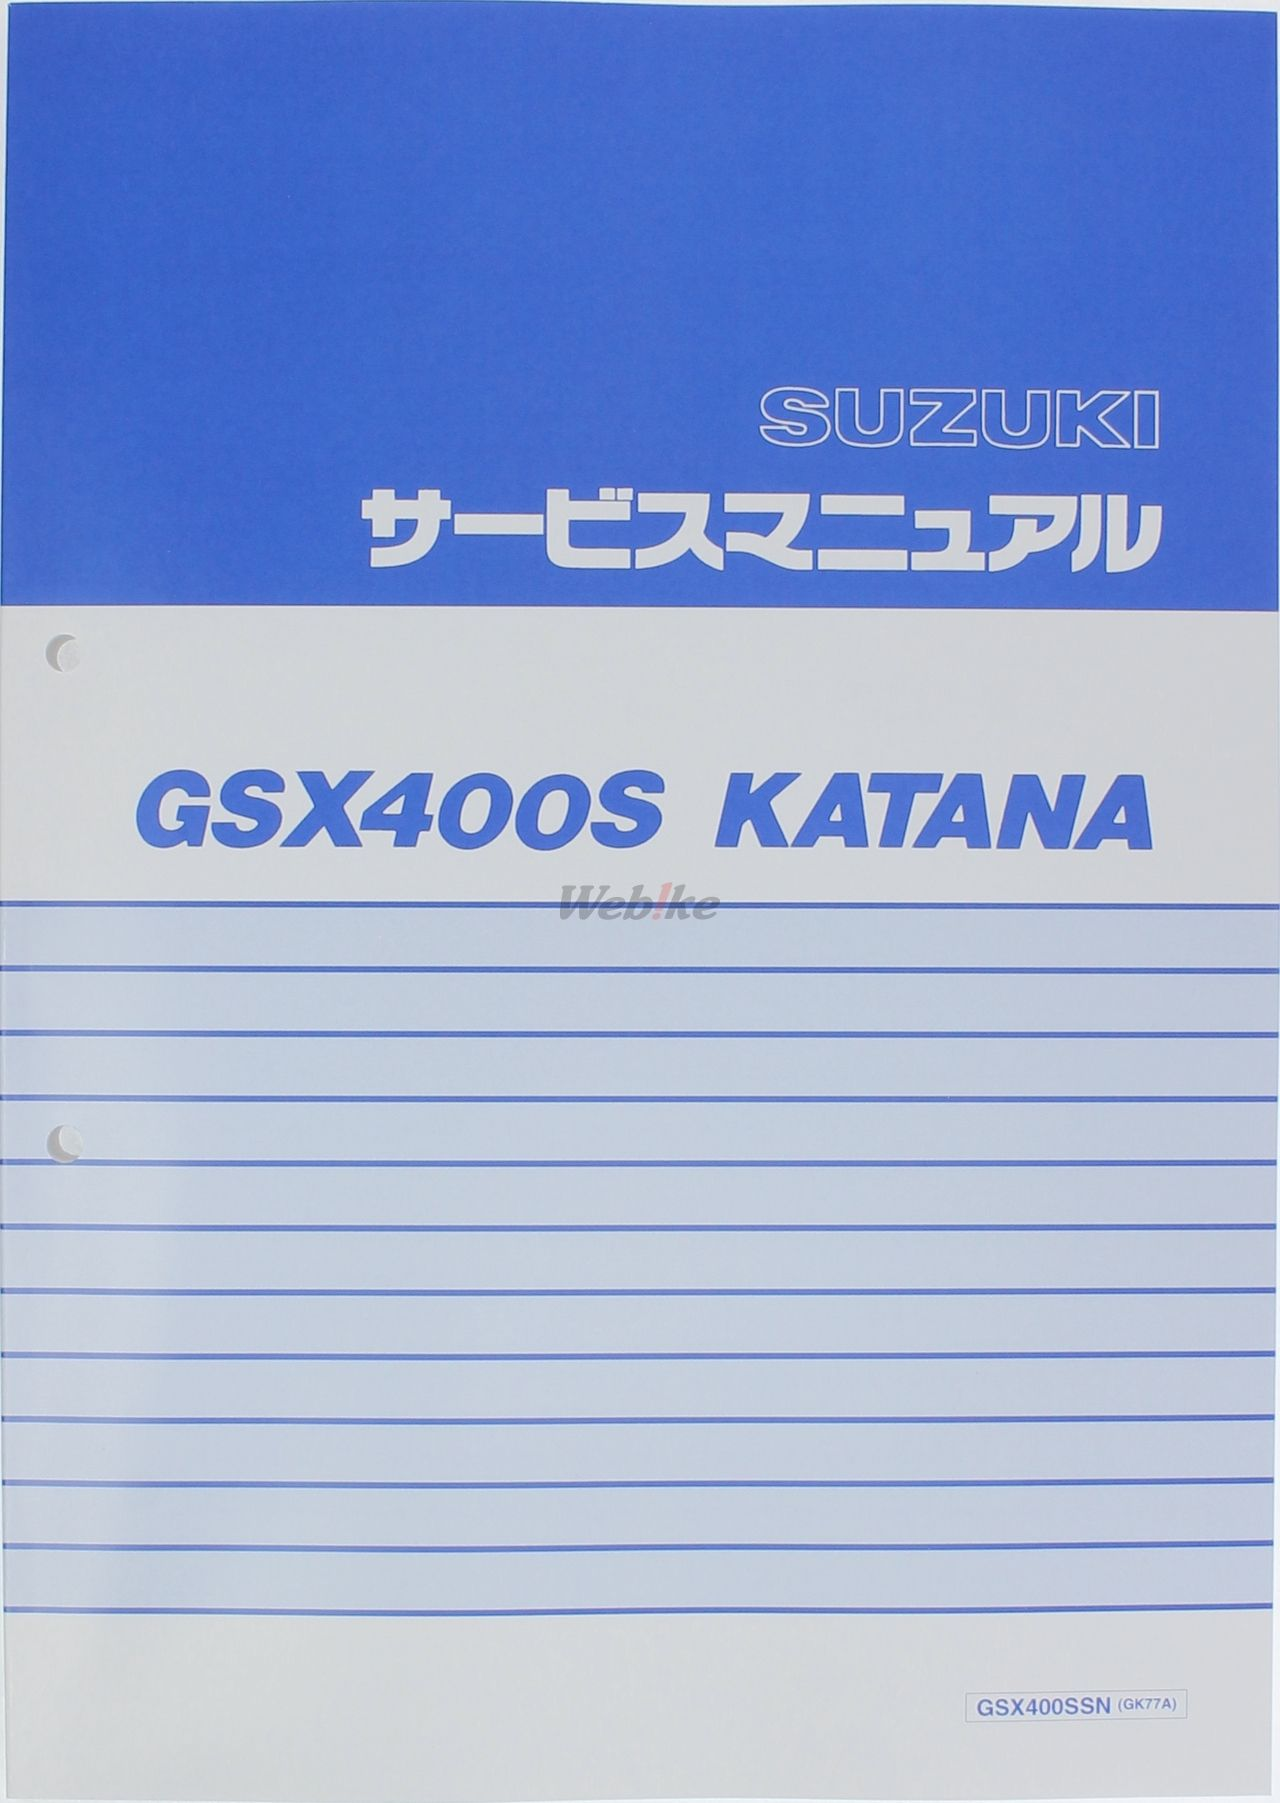 【SUZUKI】GSX400/GSX400S KATANA 維修手冊 - 「Webike-摩托百貨」